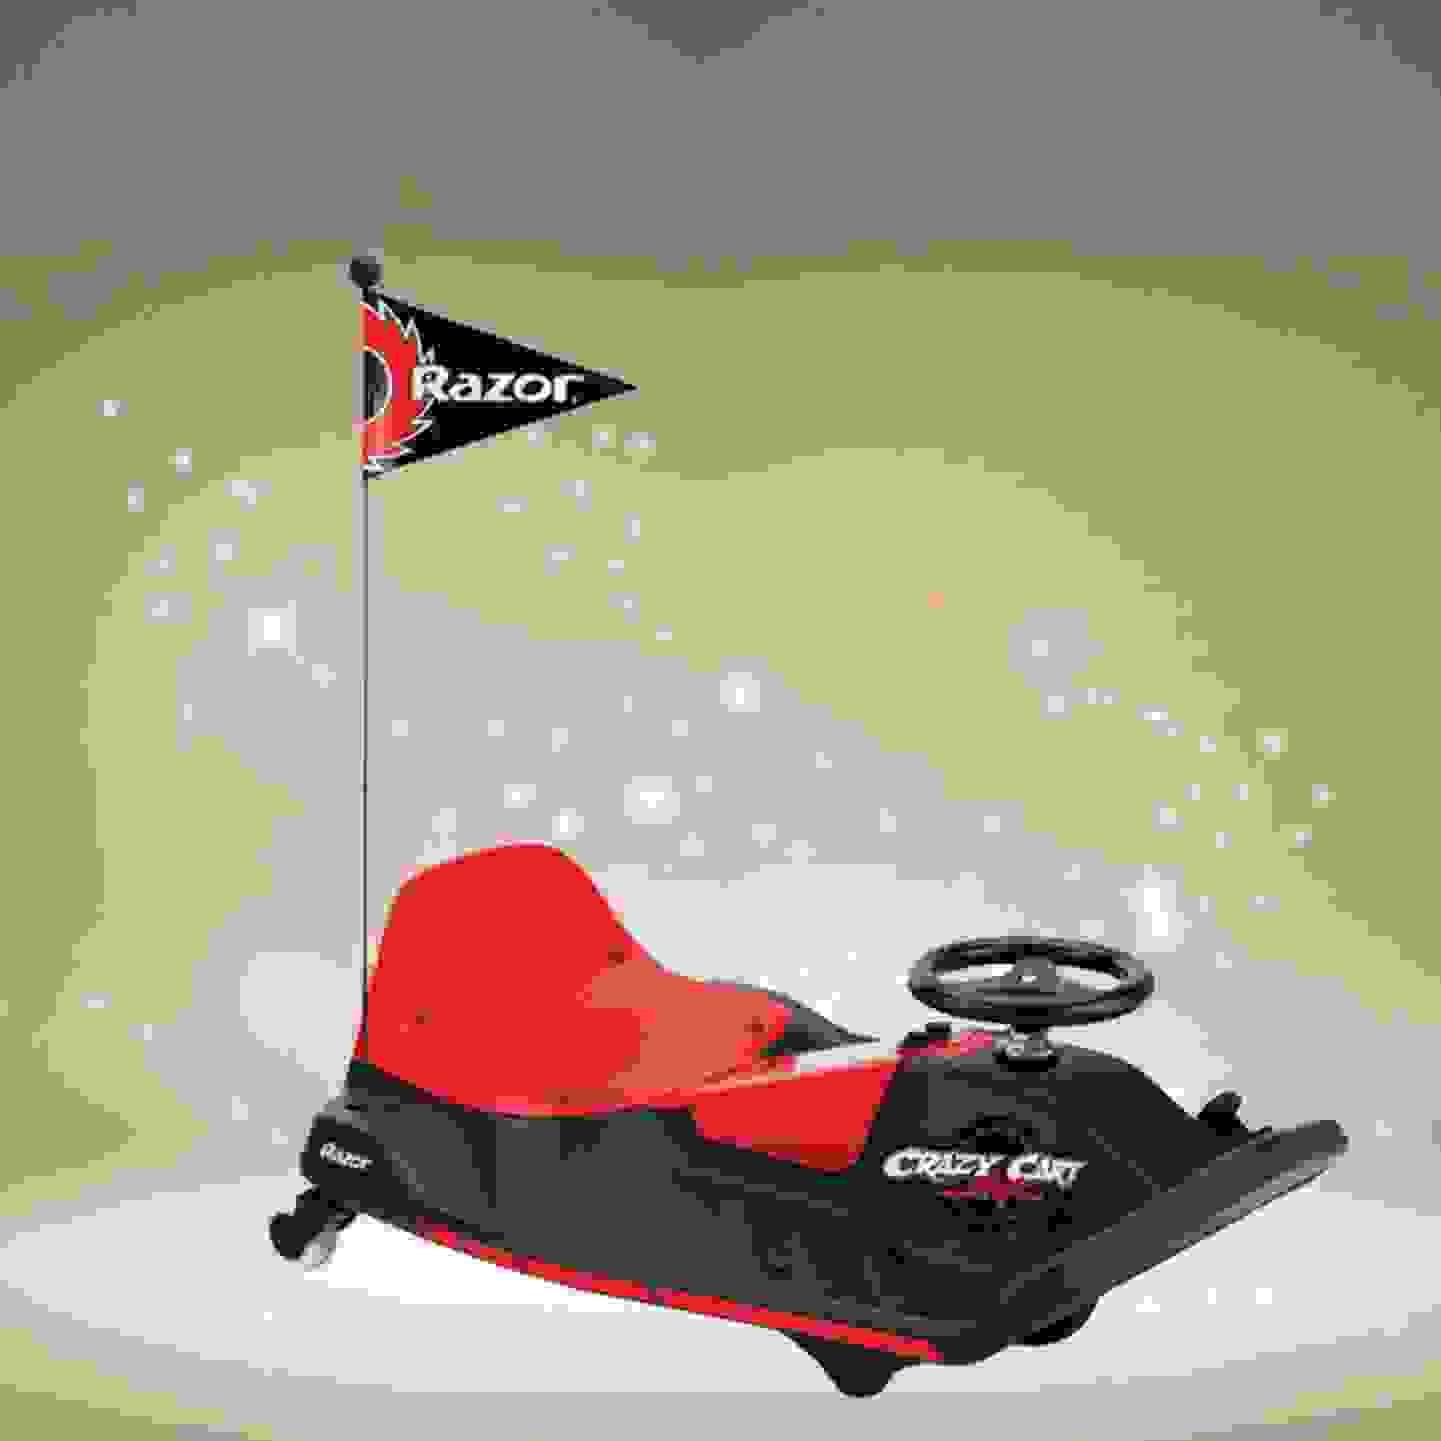 Razor - Crazy Shift E-Cart »